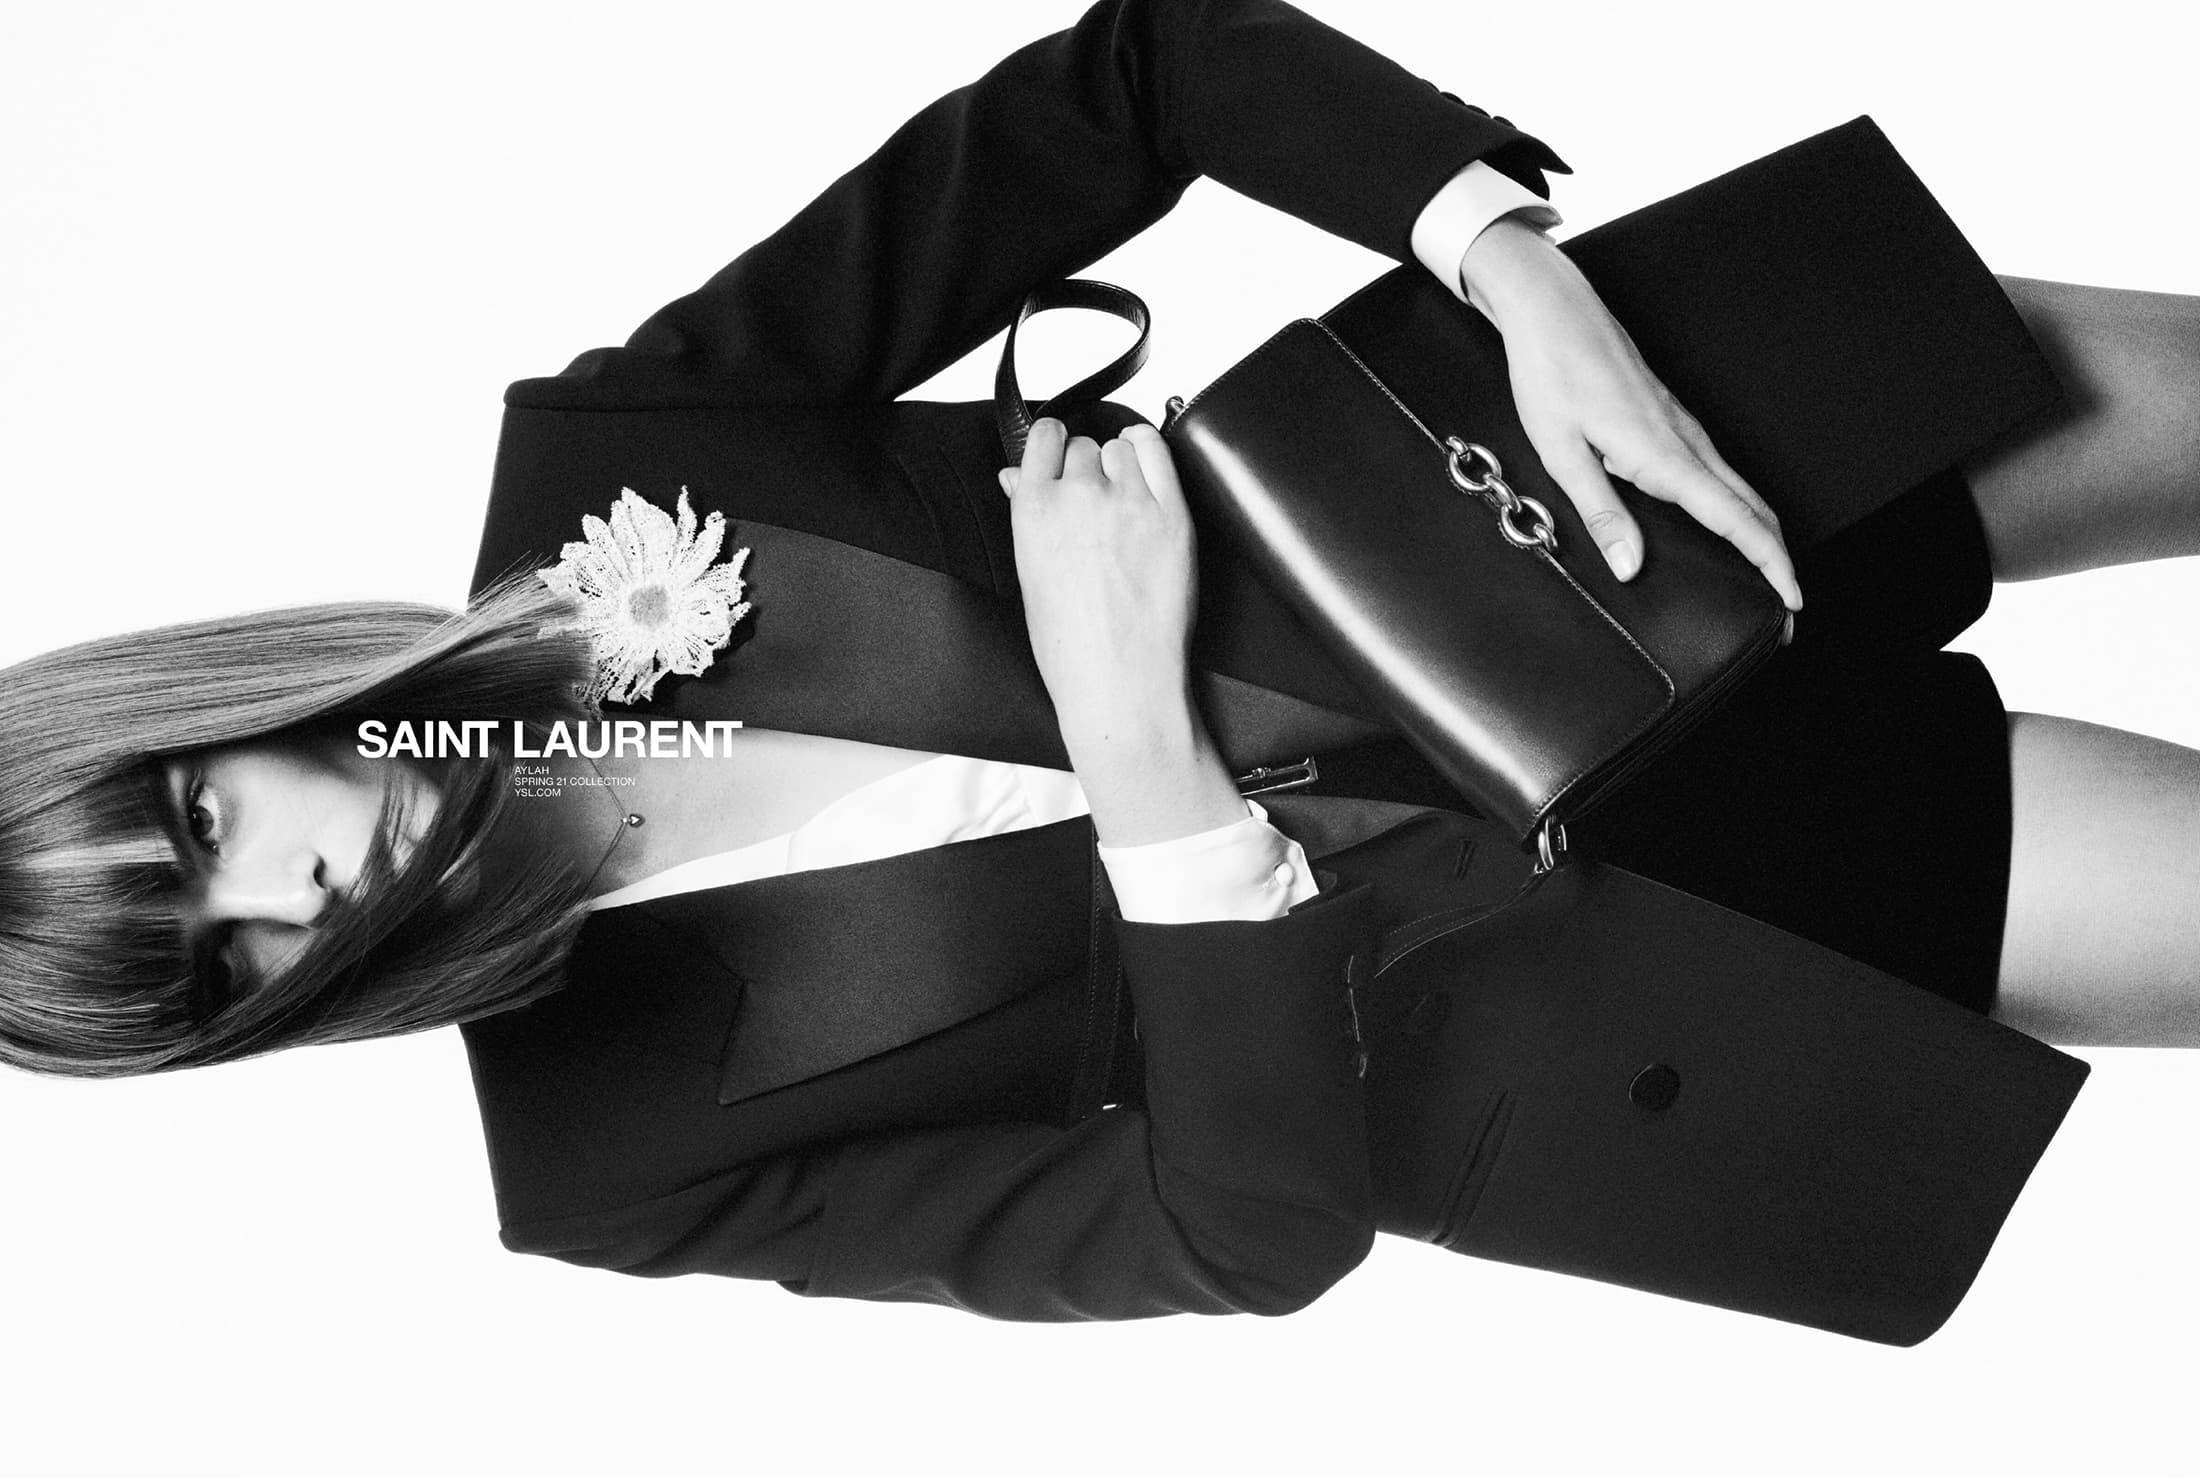 SAINT LAURENT #YSL37 SPRING 2021 AD CAMPAIGN